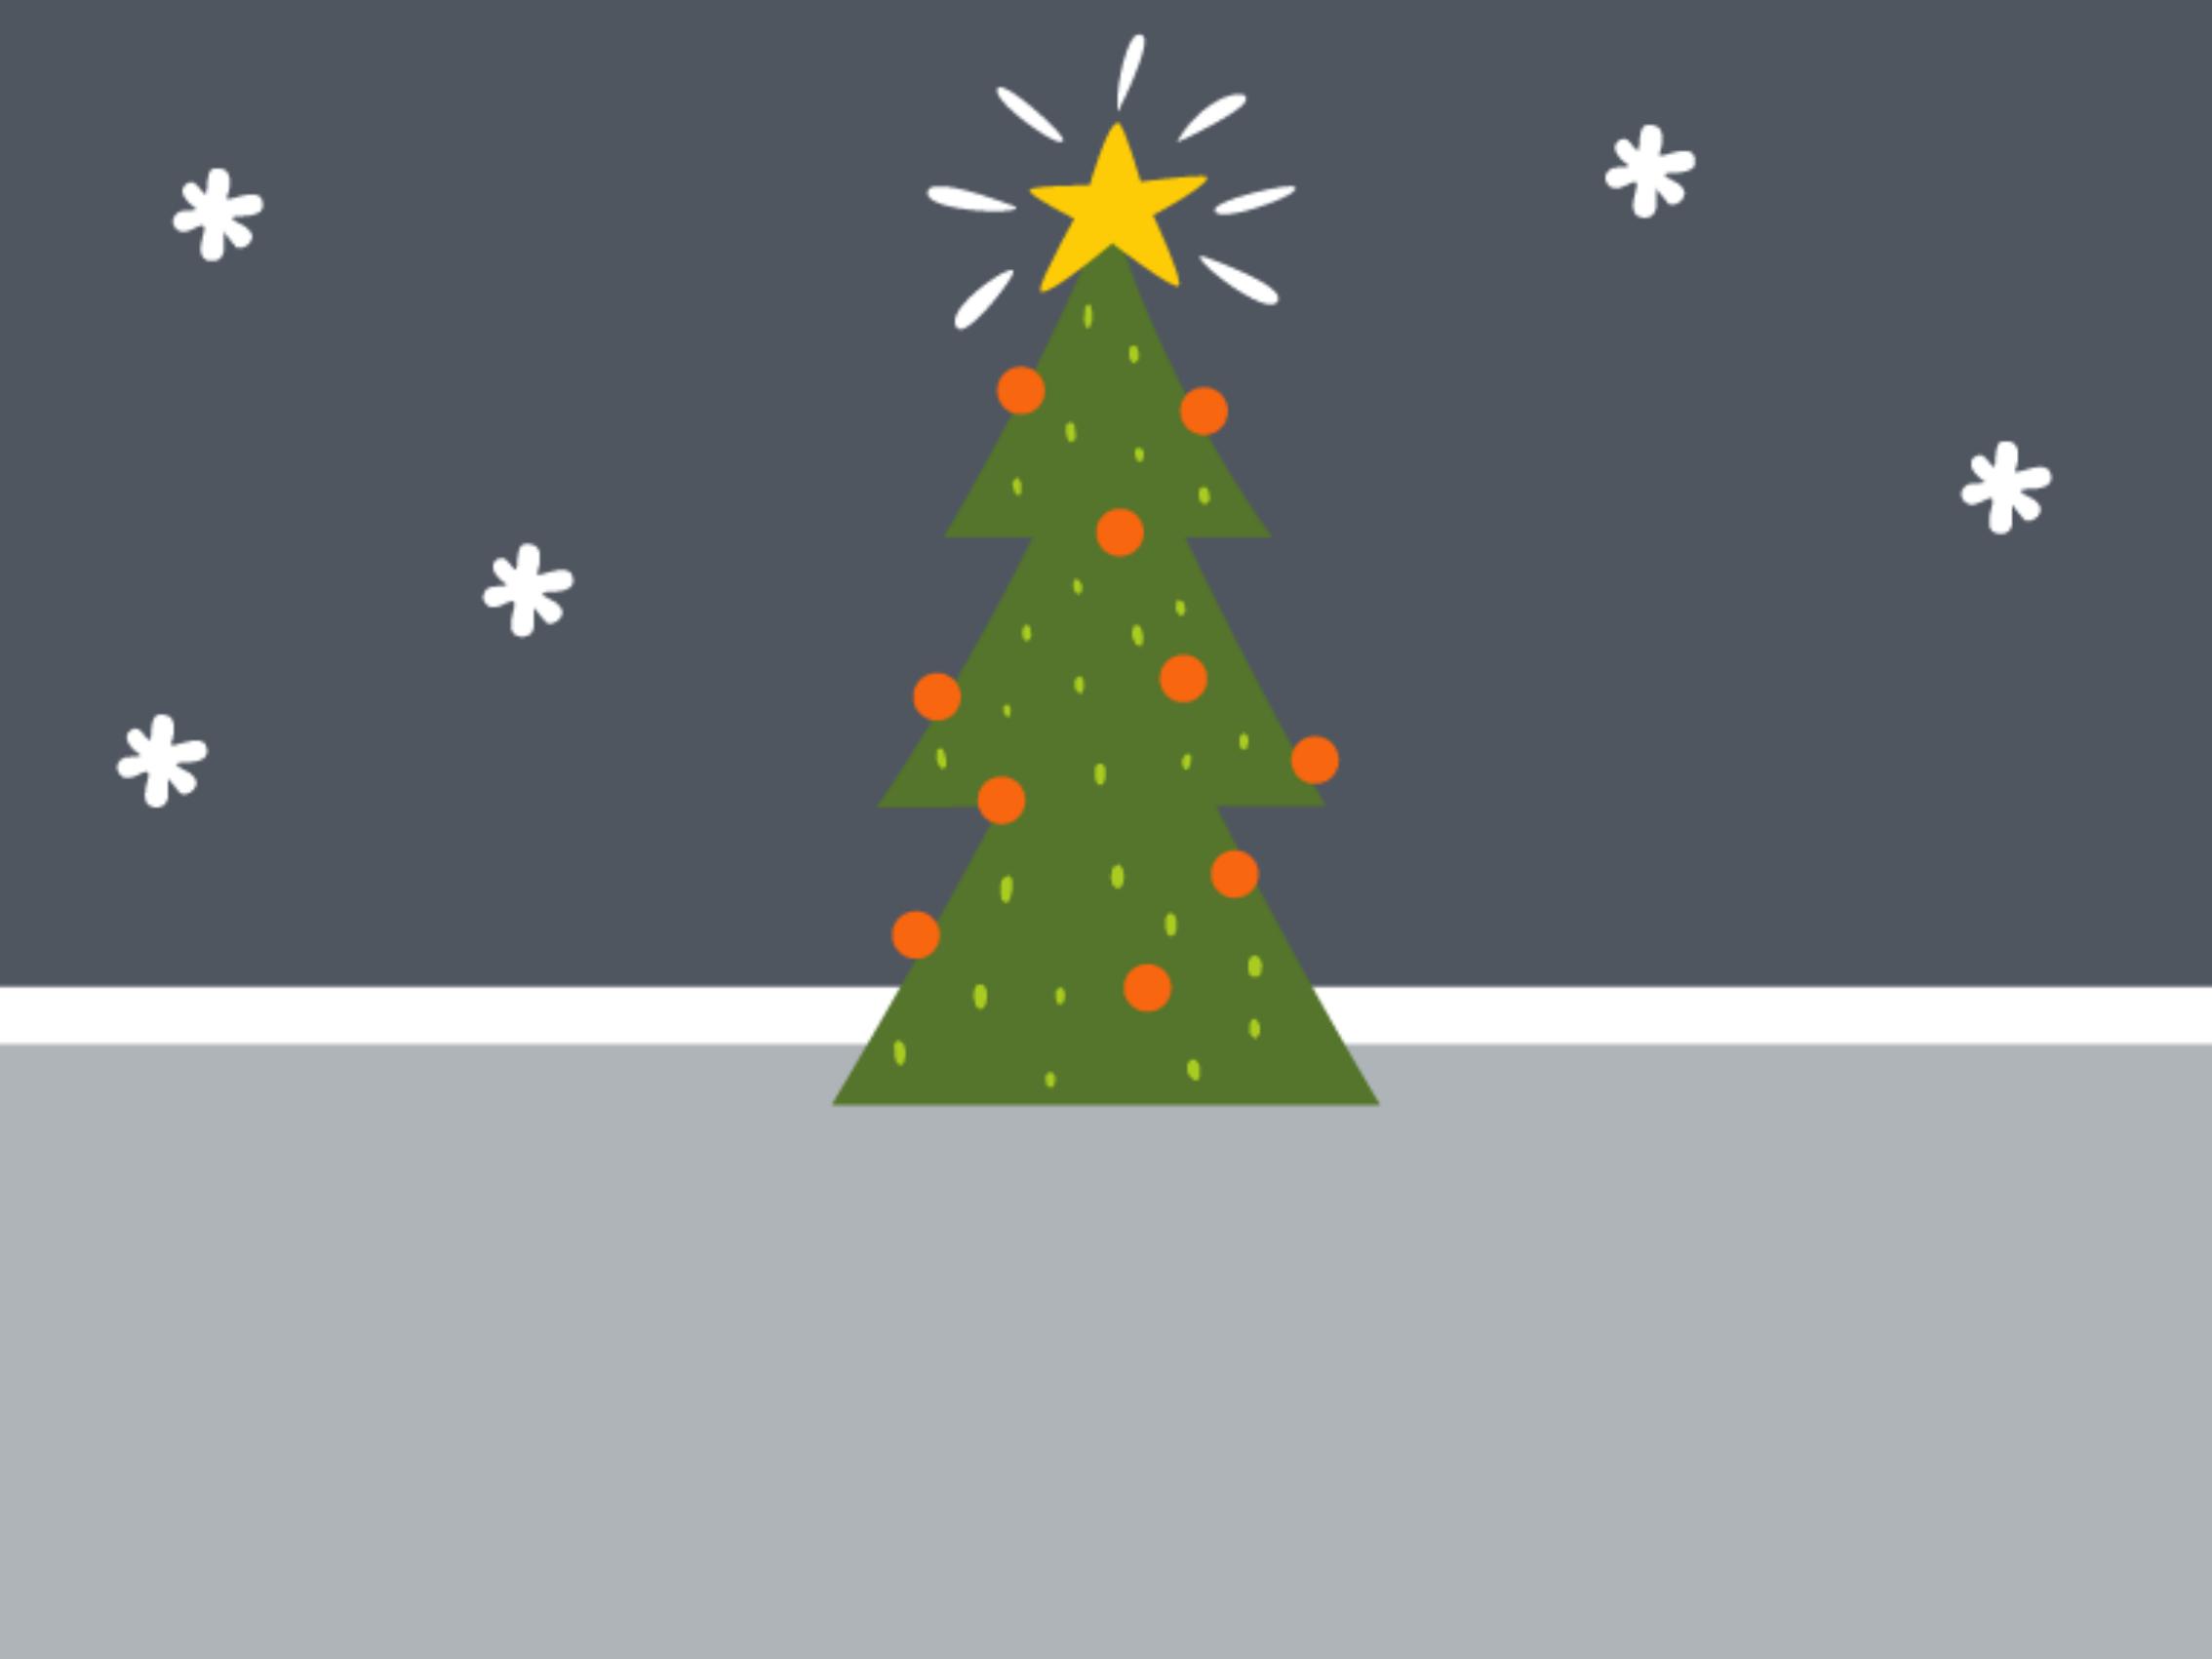 Christmas tree 999-1818